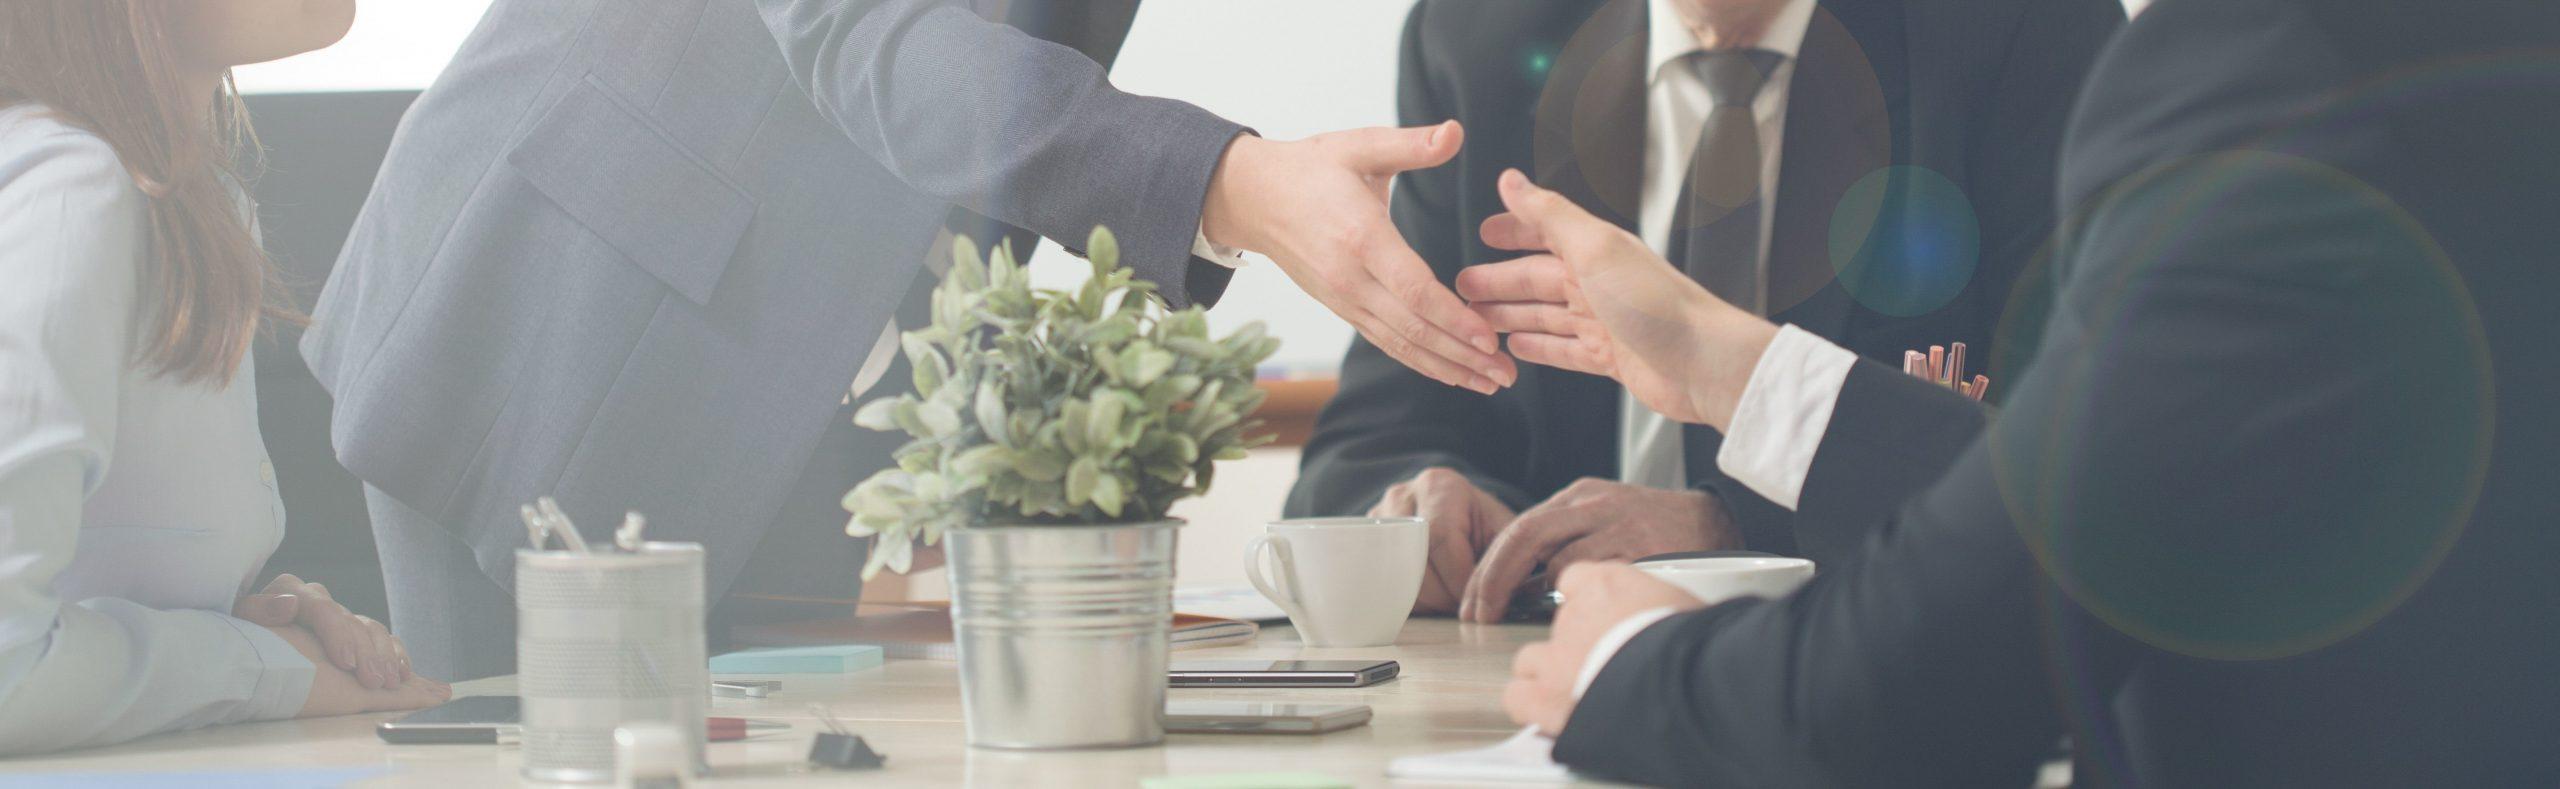 Digital Signage – HR's Essential Communication Tool?